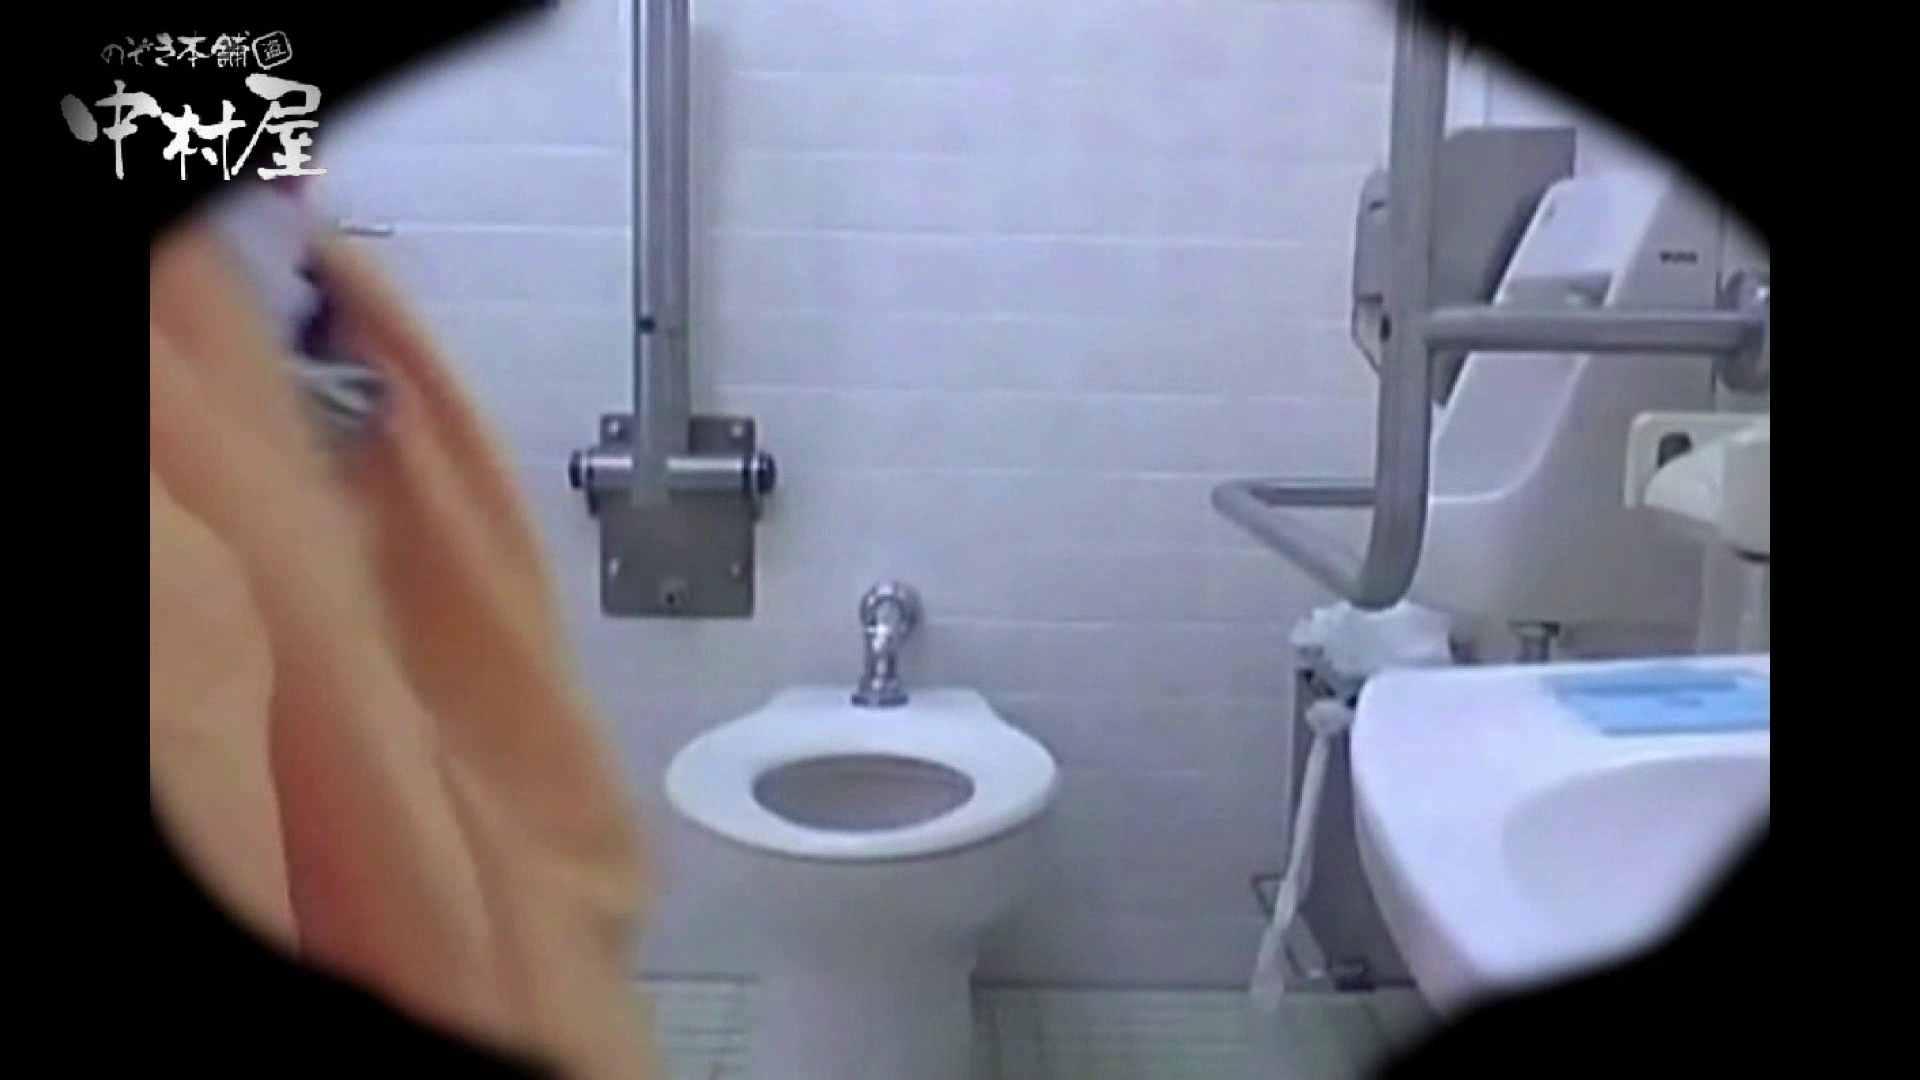 teen galトイレ覗き紙がナイ編‼vol.13 トイレハメ撮り 盗み撮り動画キャプチャ 12pic 10